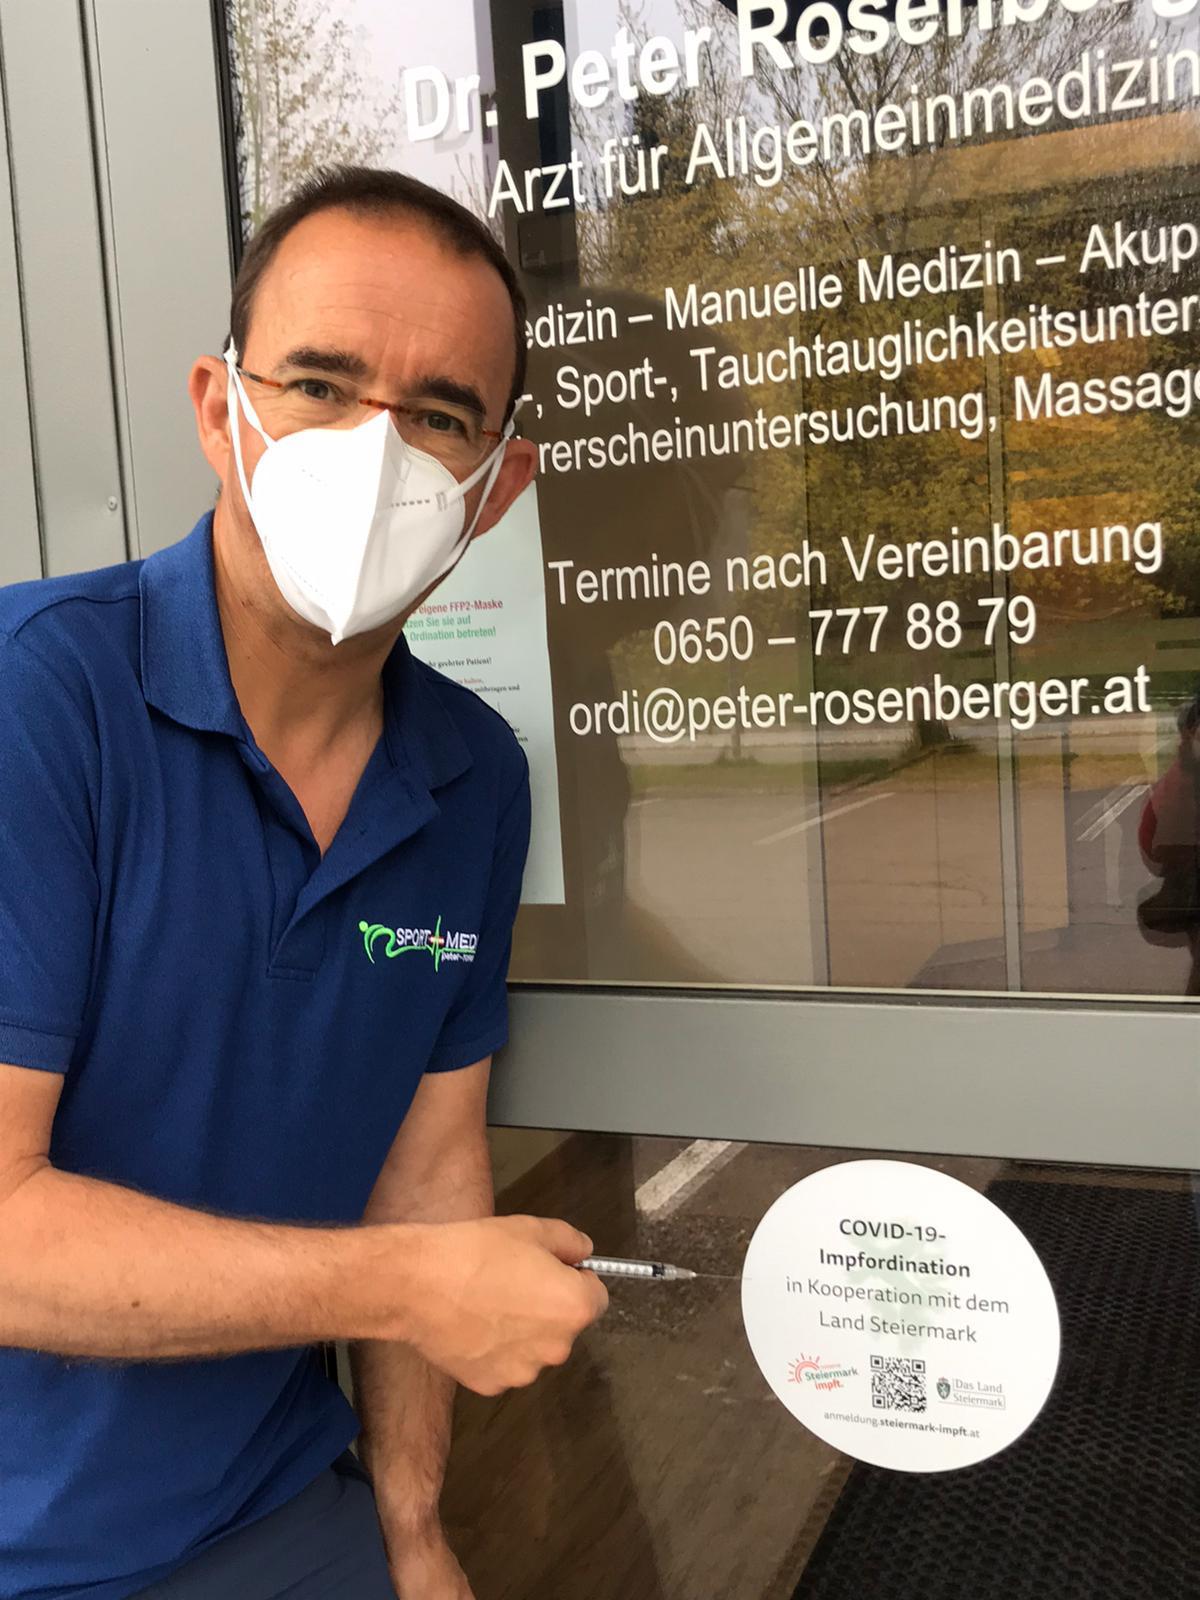 Covid 19 Impfordination Steiermark